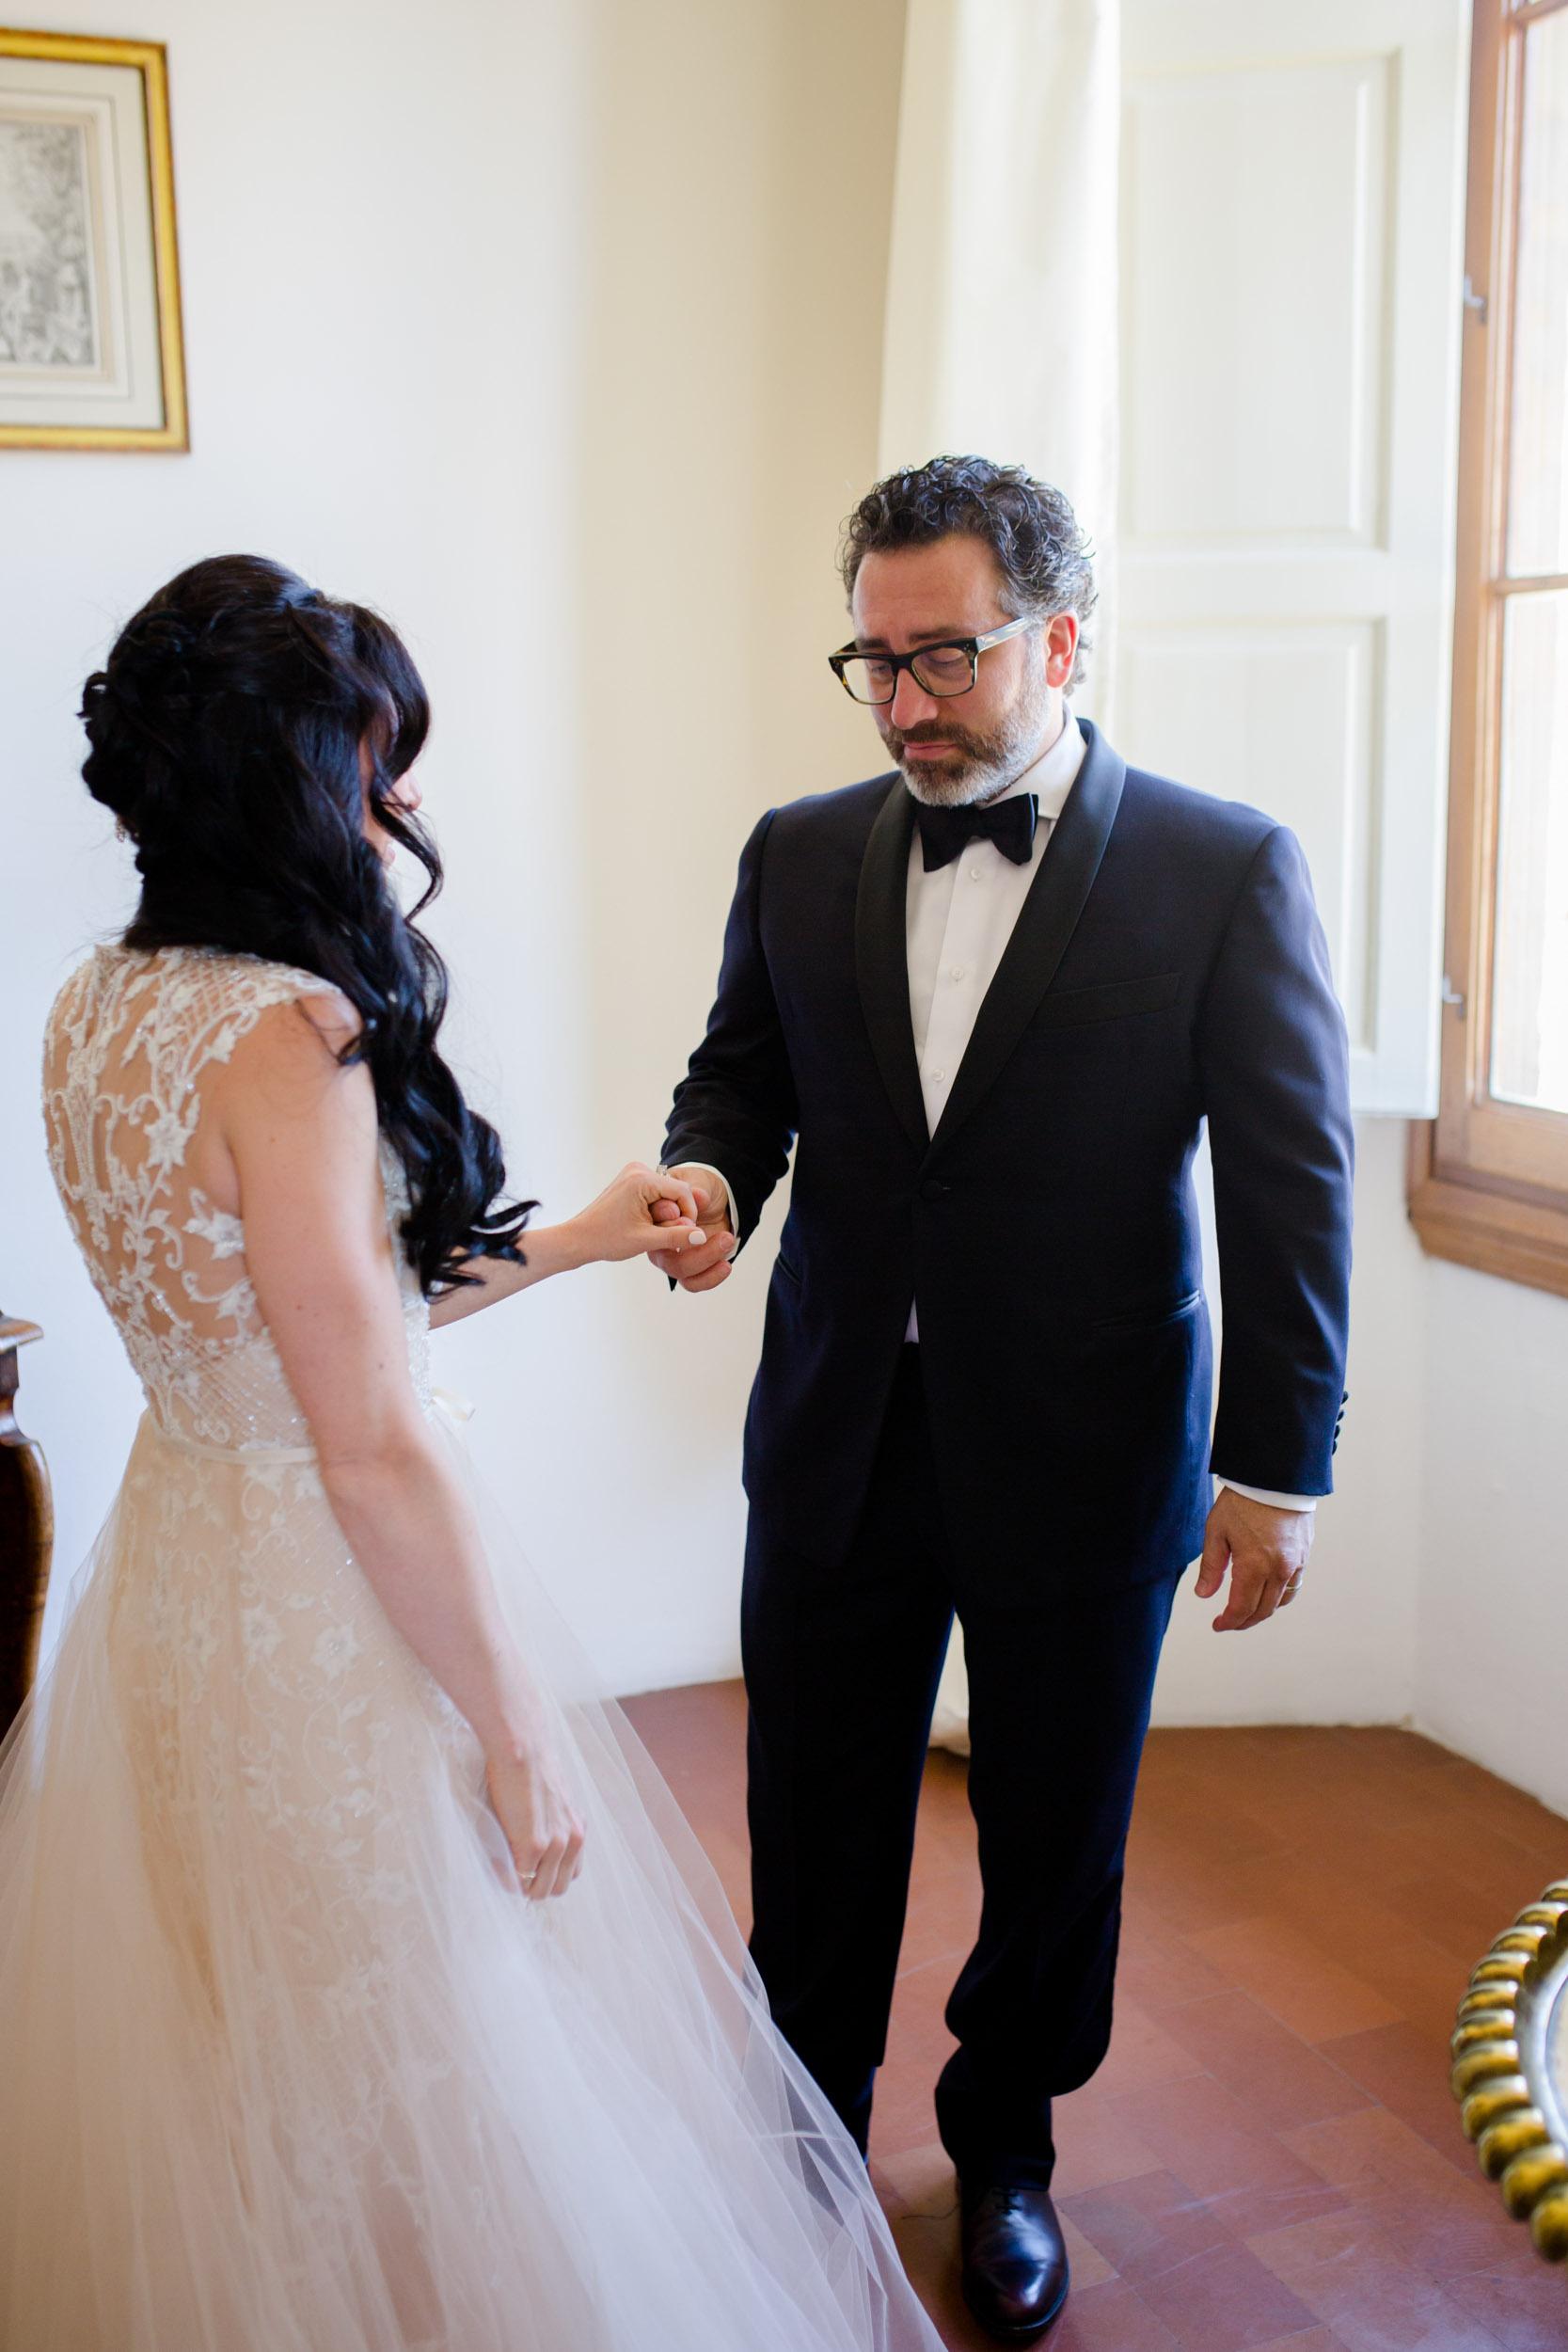 villa-gamberaia-florence-italy-destination-wedding-17.jpg